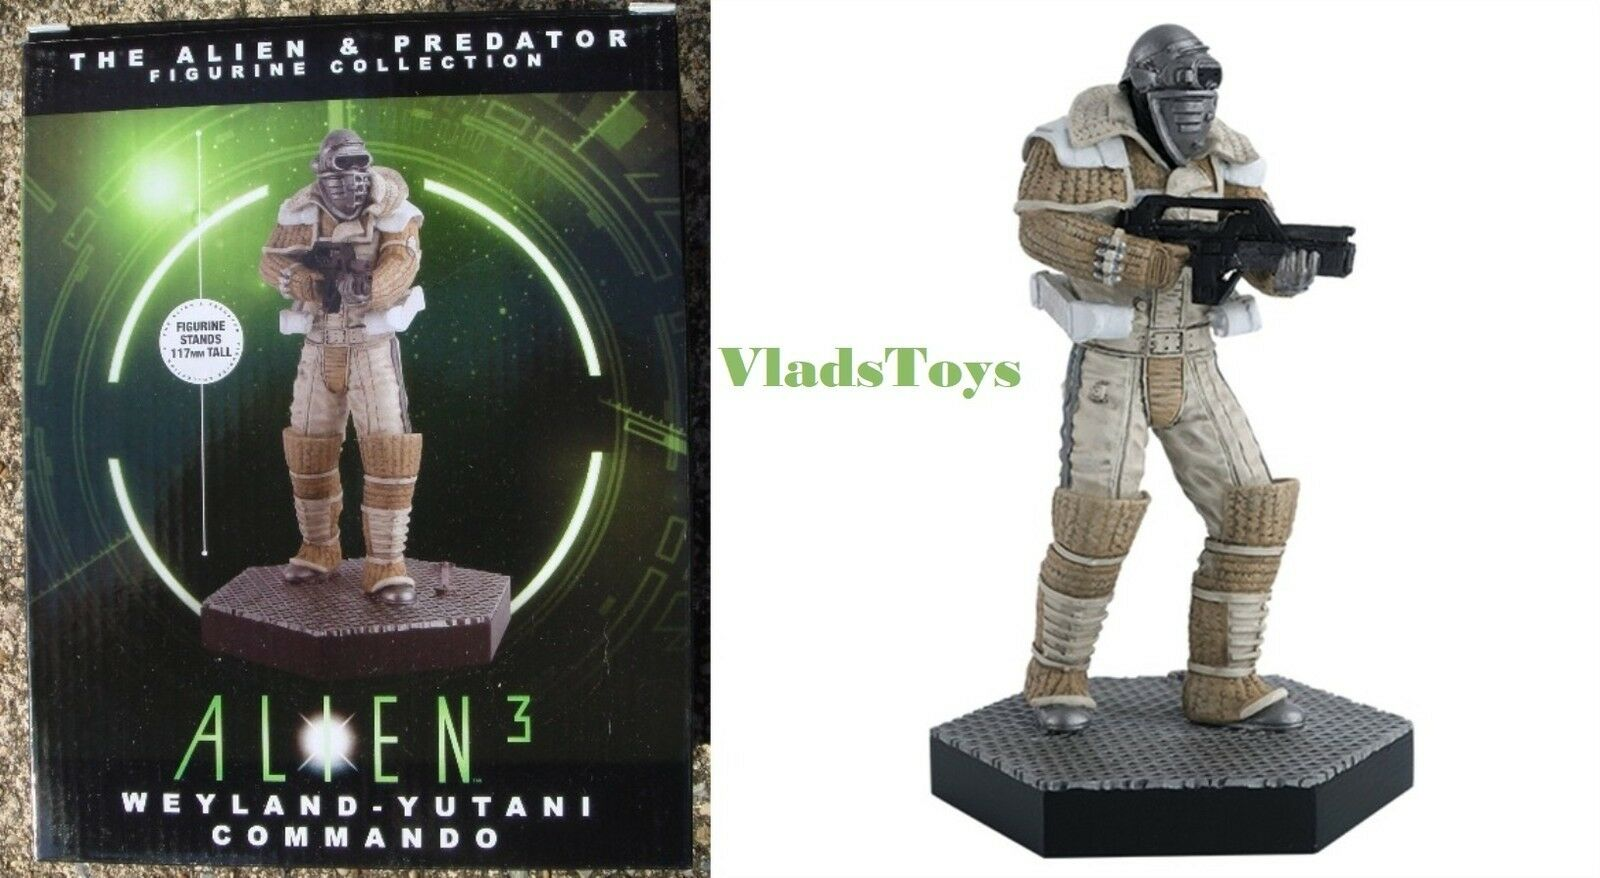 Eaglemoss 1 16 Alien & Predator Weyland-Yutani Commando Alien 3 Issue 33